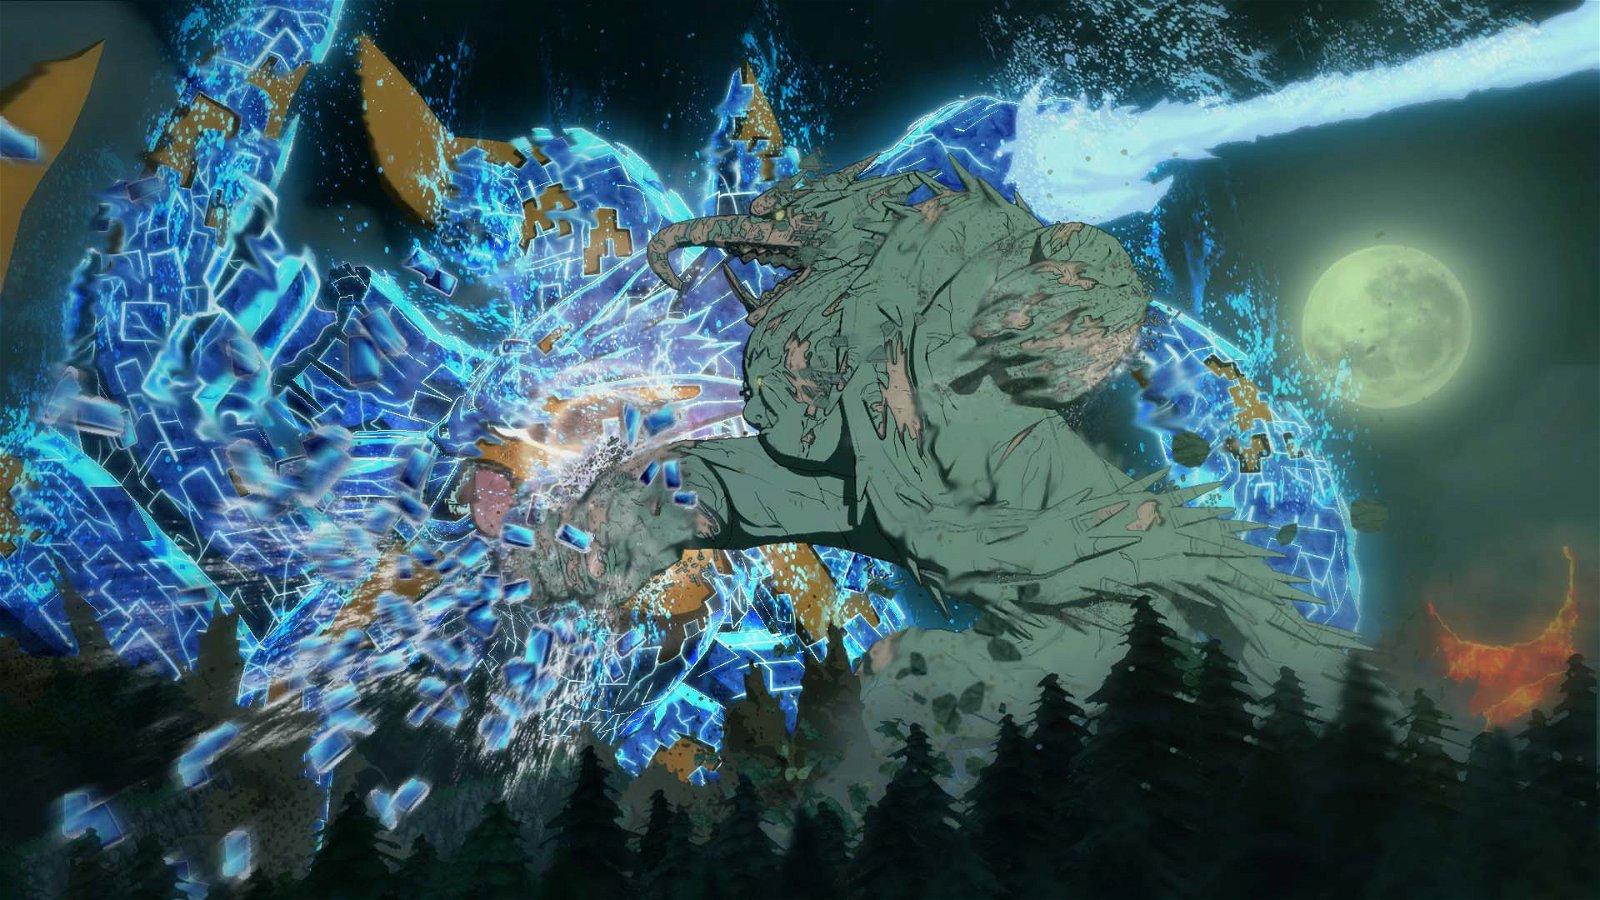 Naruto Shippuden Ultimate Ninja Storm 4 (Ps4) Review 1